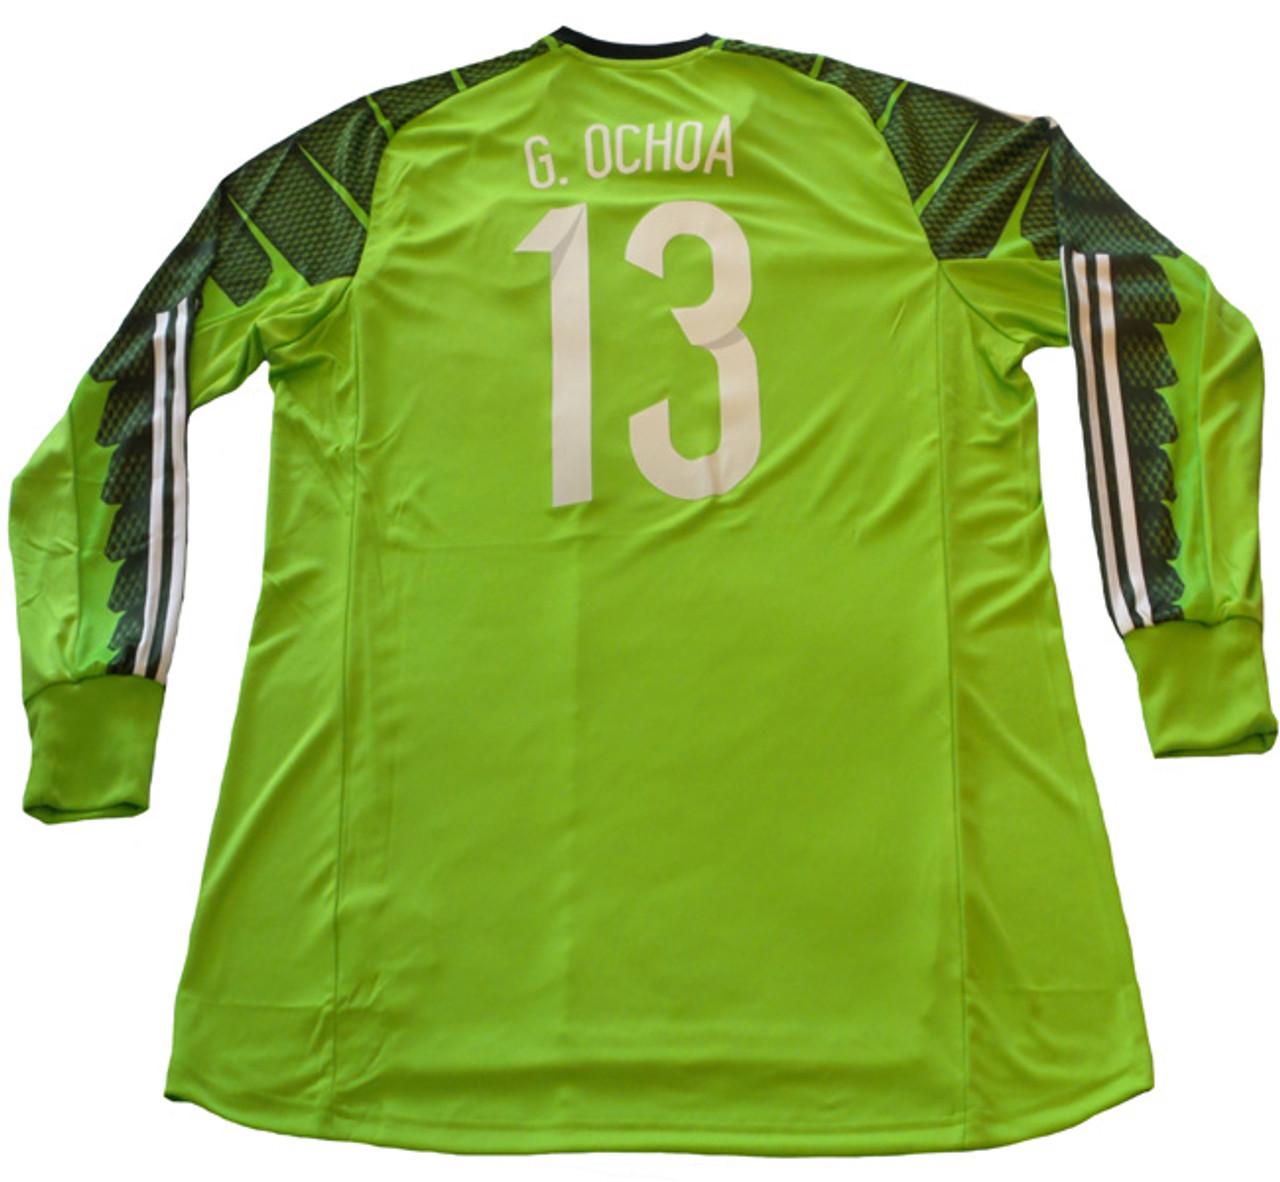 f5b4f773c ADIDAS MEXICO 2015 OCHOA HOME G K JERSEY - Soccer Plus